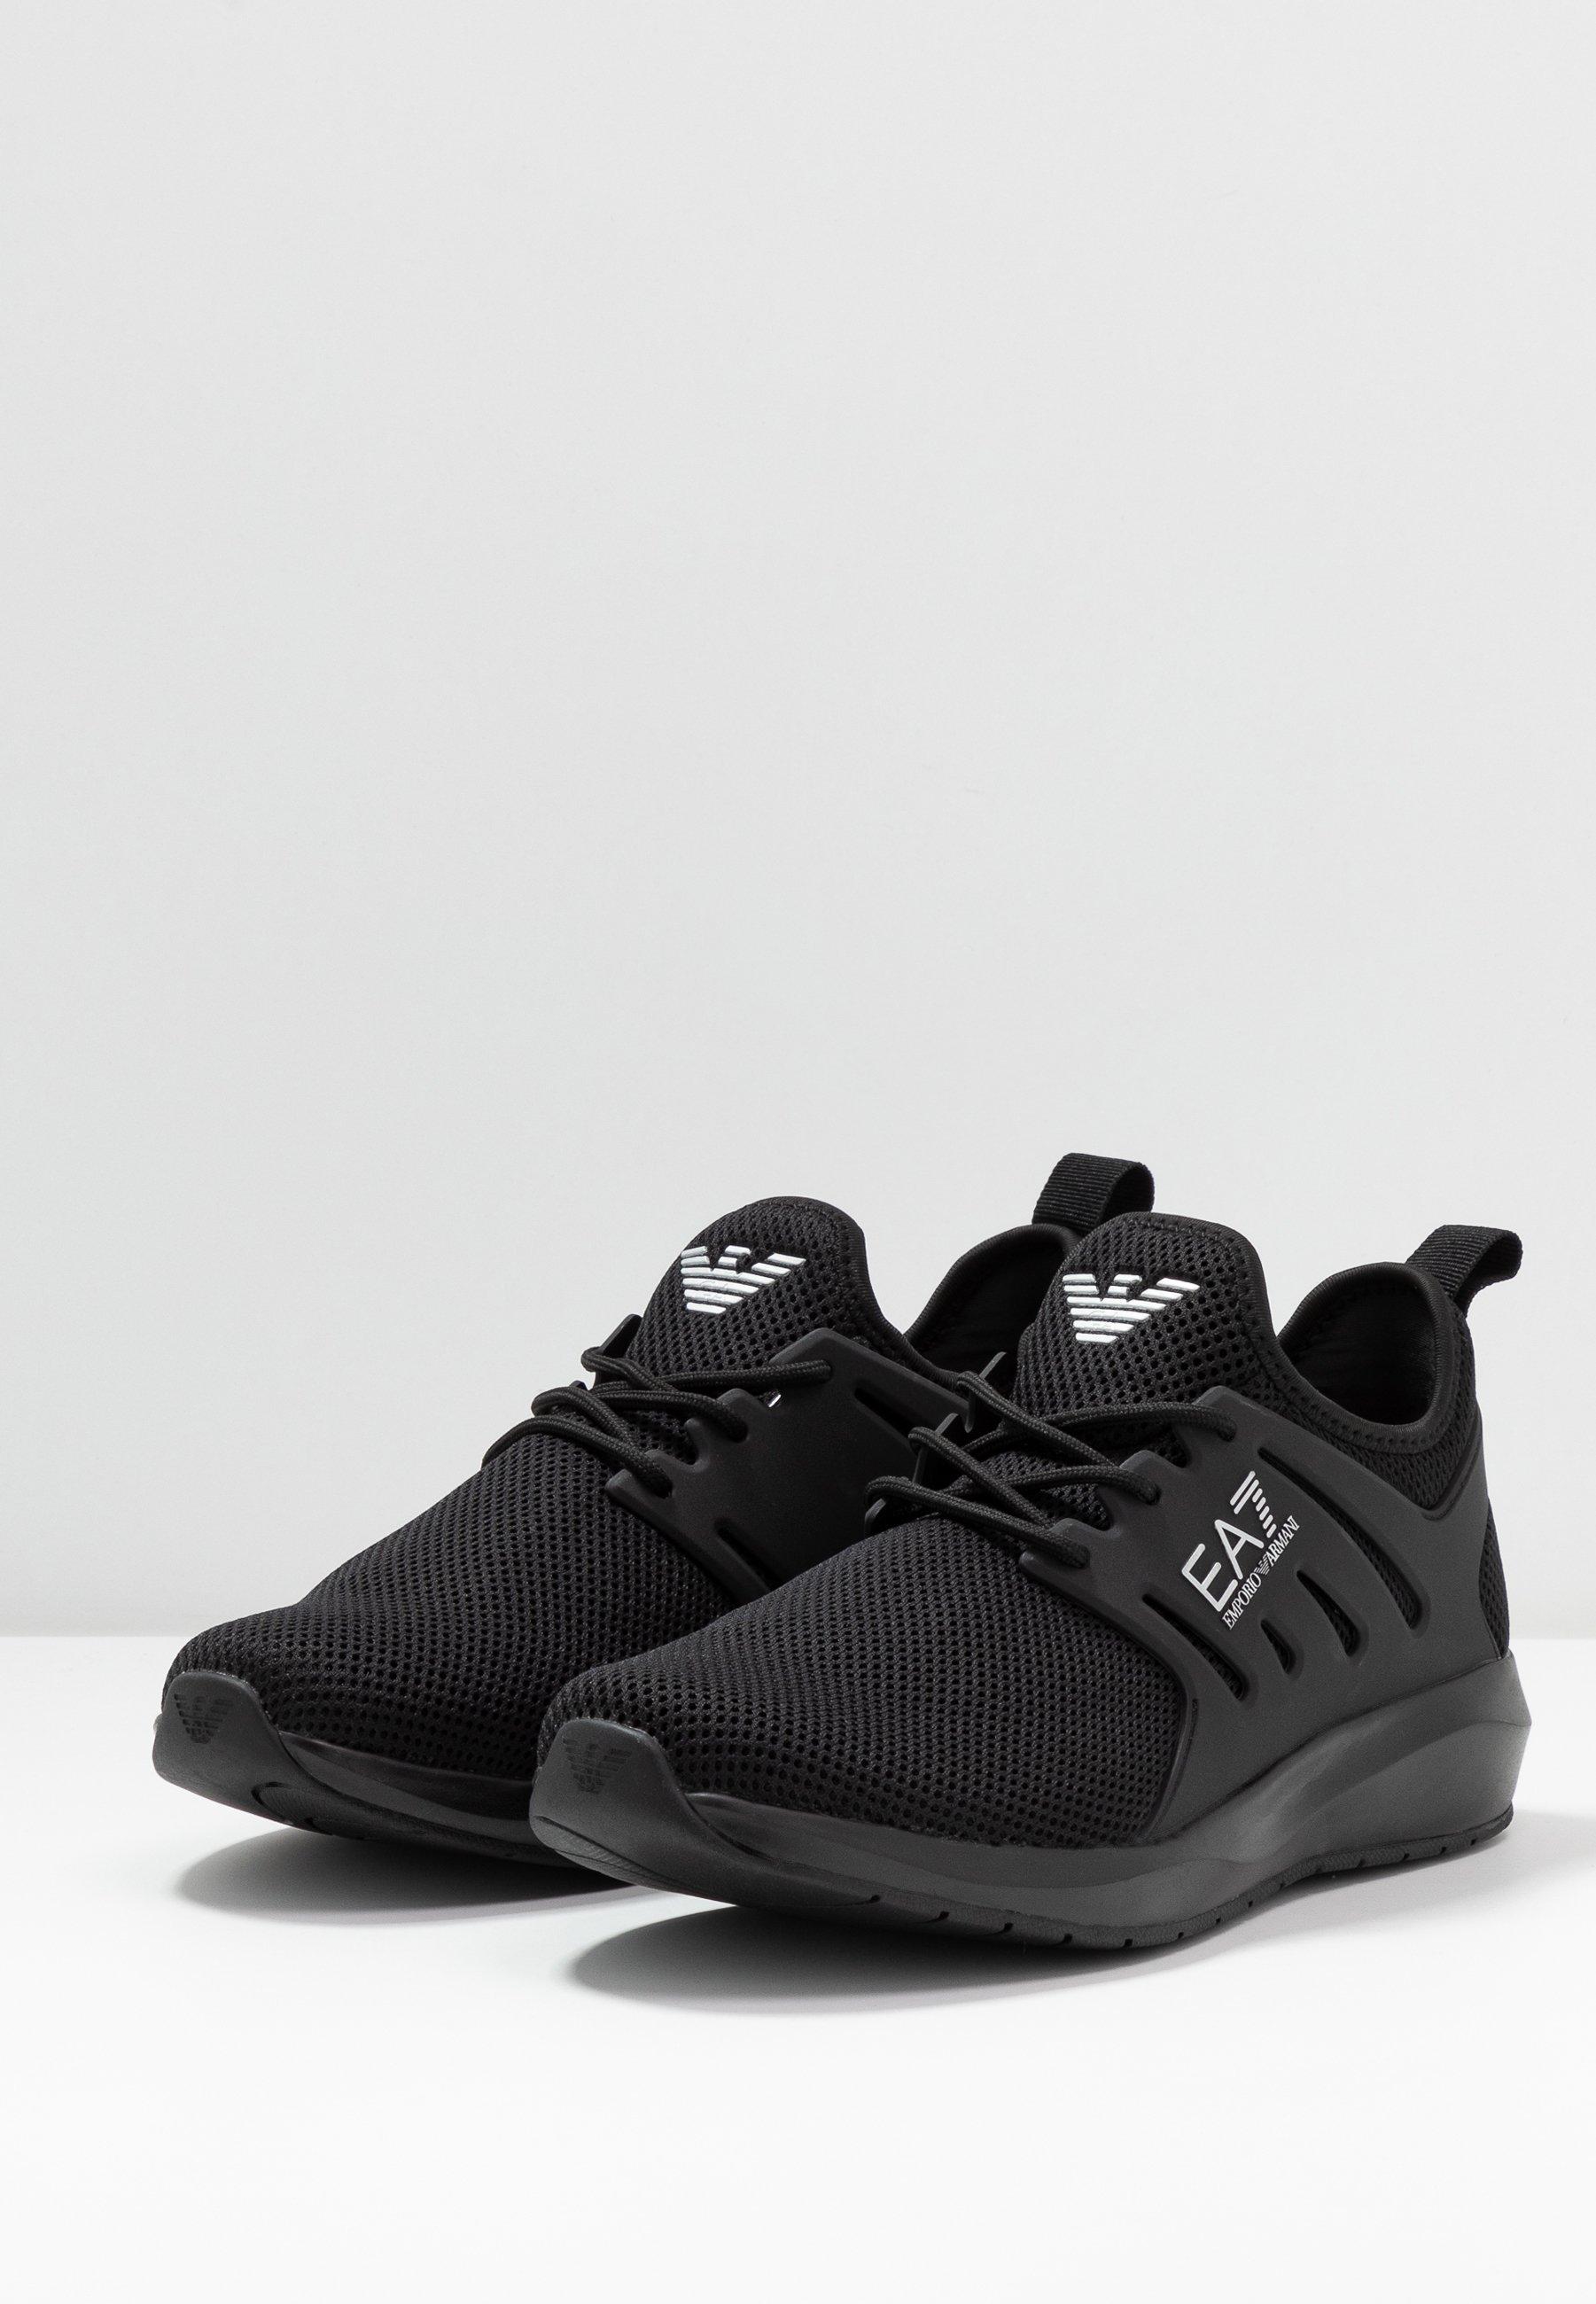 Ea7 Emporio Armani Sneakers - Triple Black